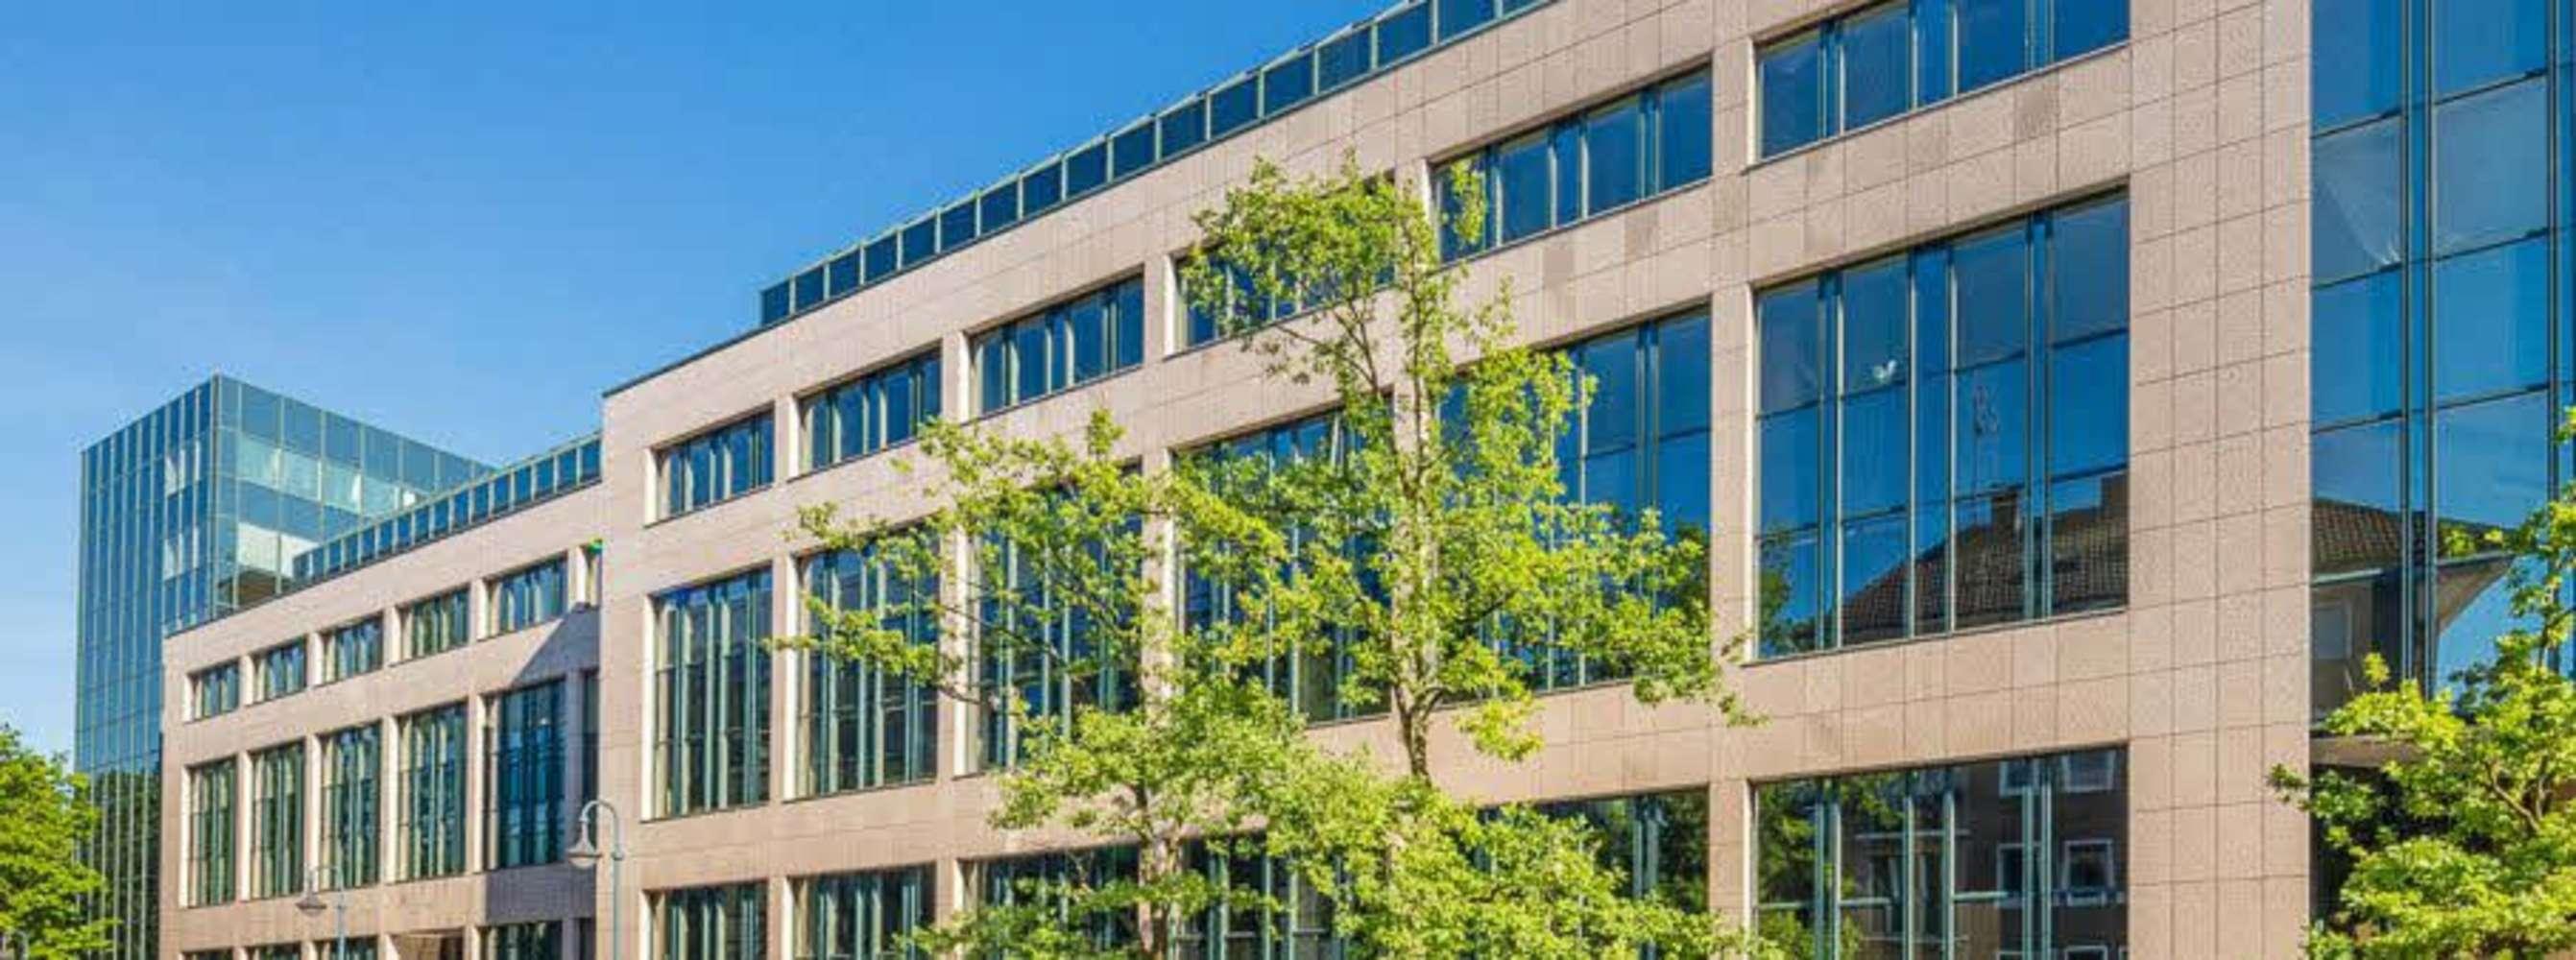 Büros Frankfurt am main, 60322 - Büro - Frankfurt am Main, Westend-Nord - F1653 - 10605581